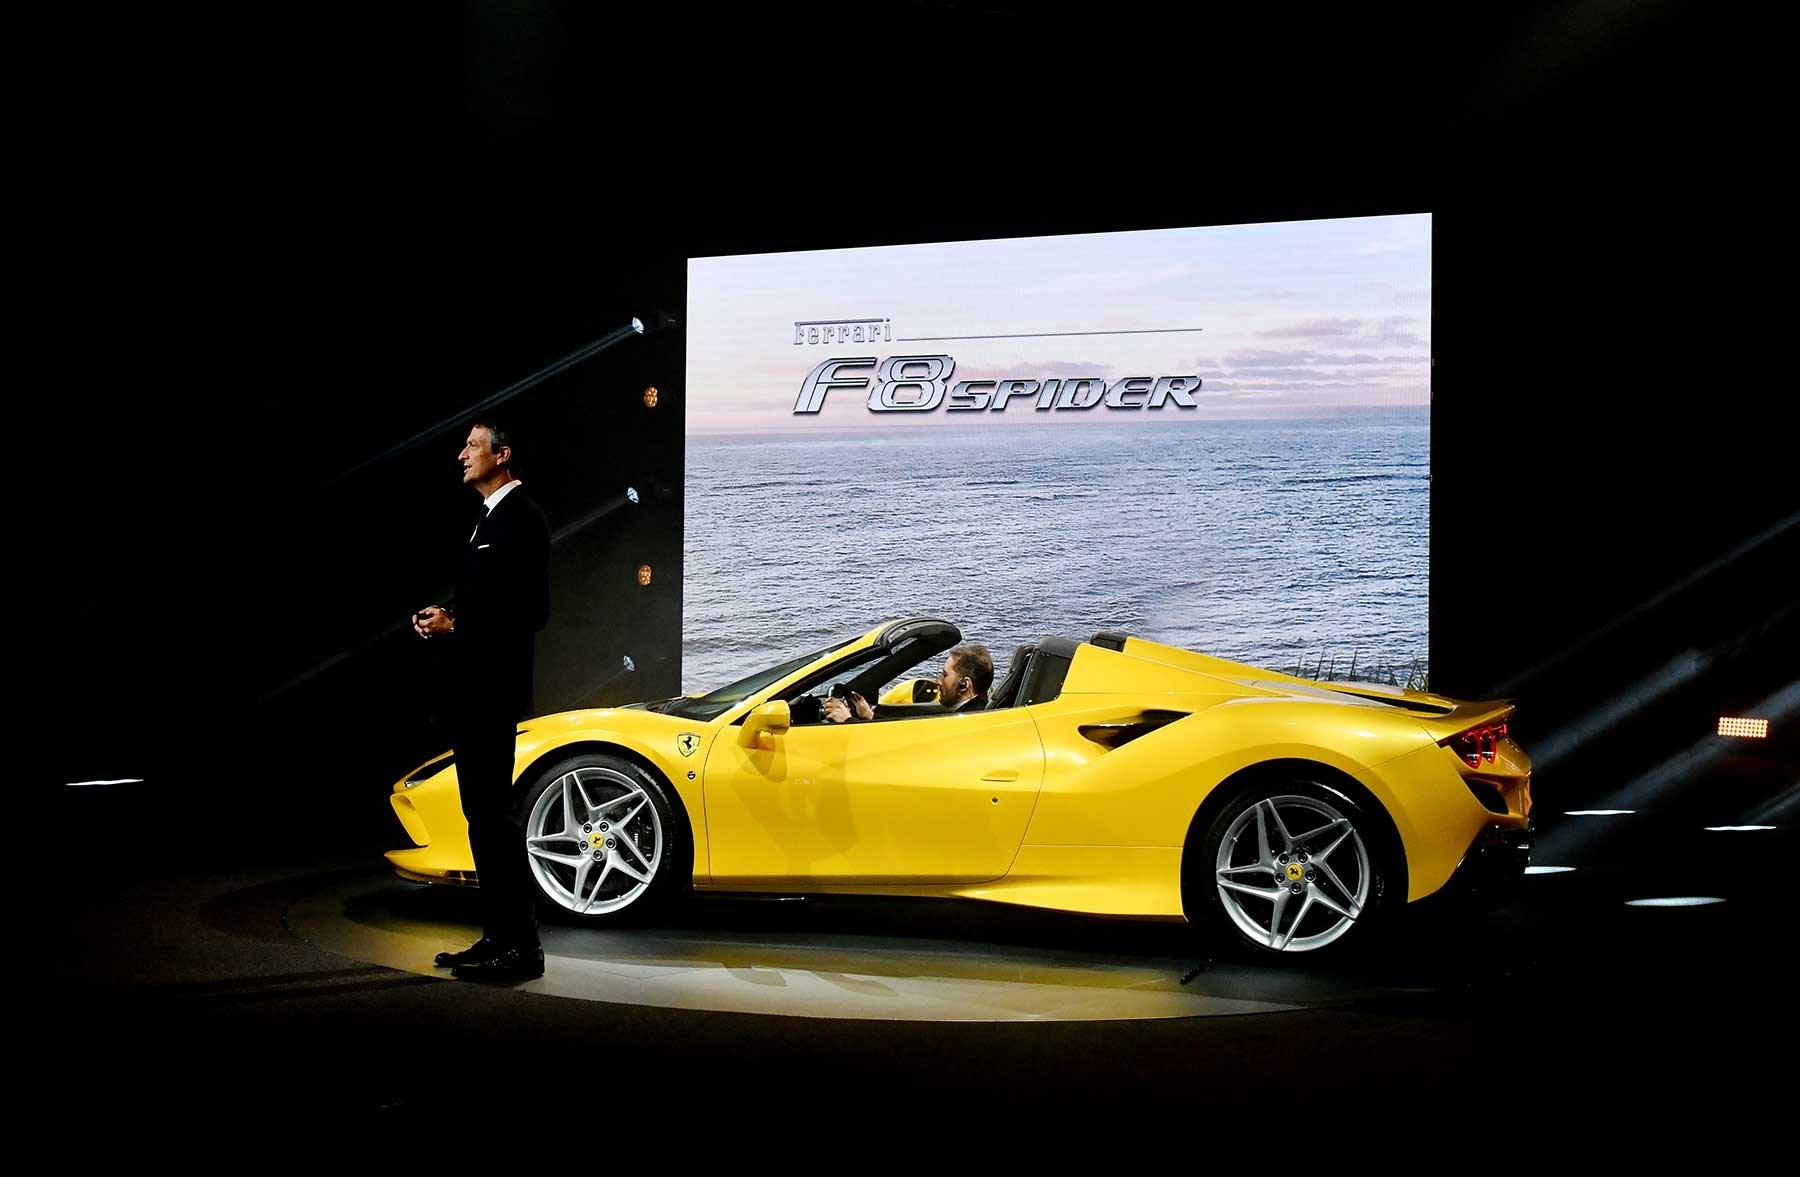 Image result for Ferrari F8 Spider V8 engine